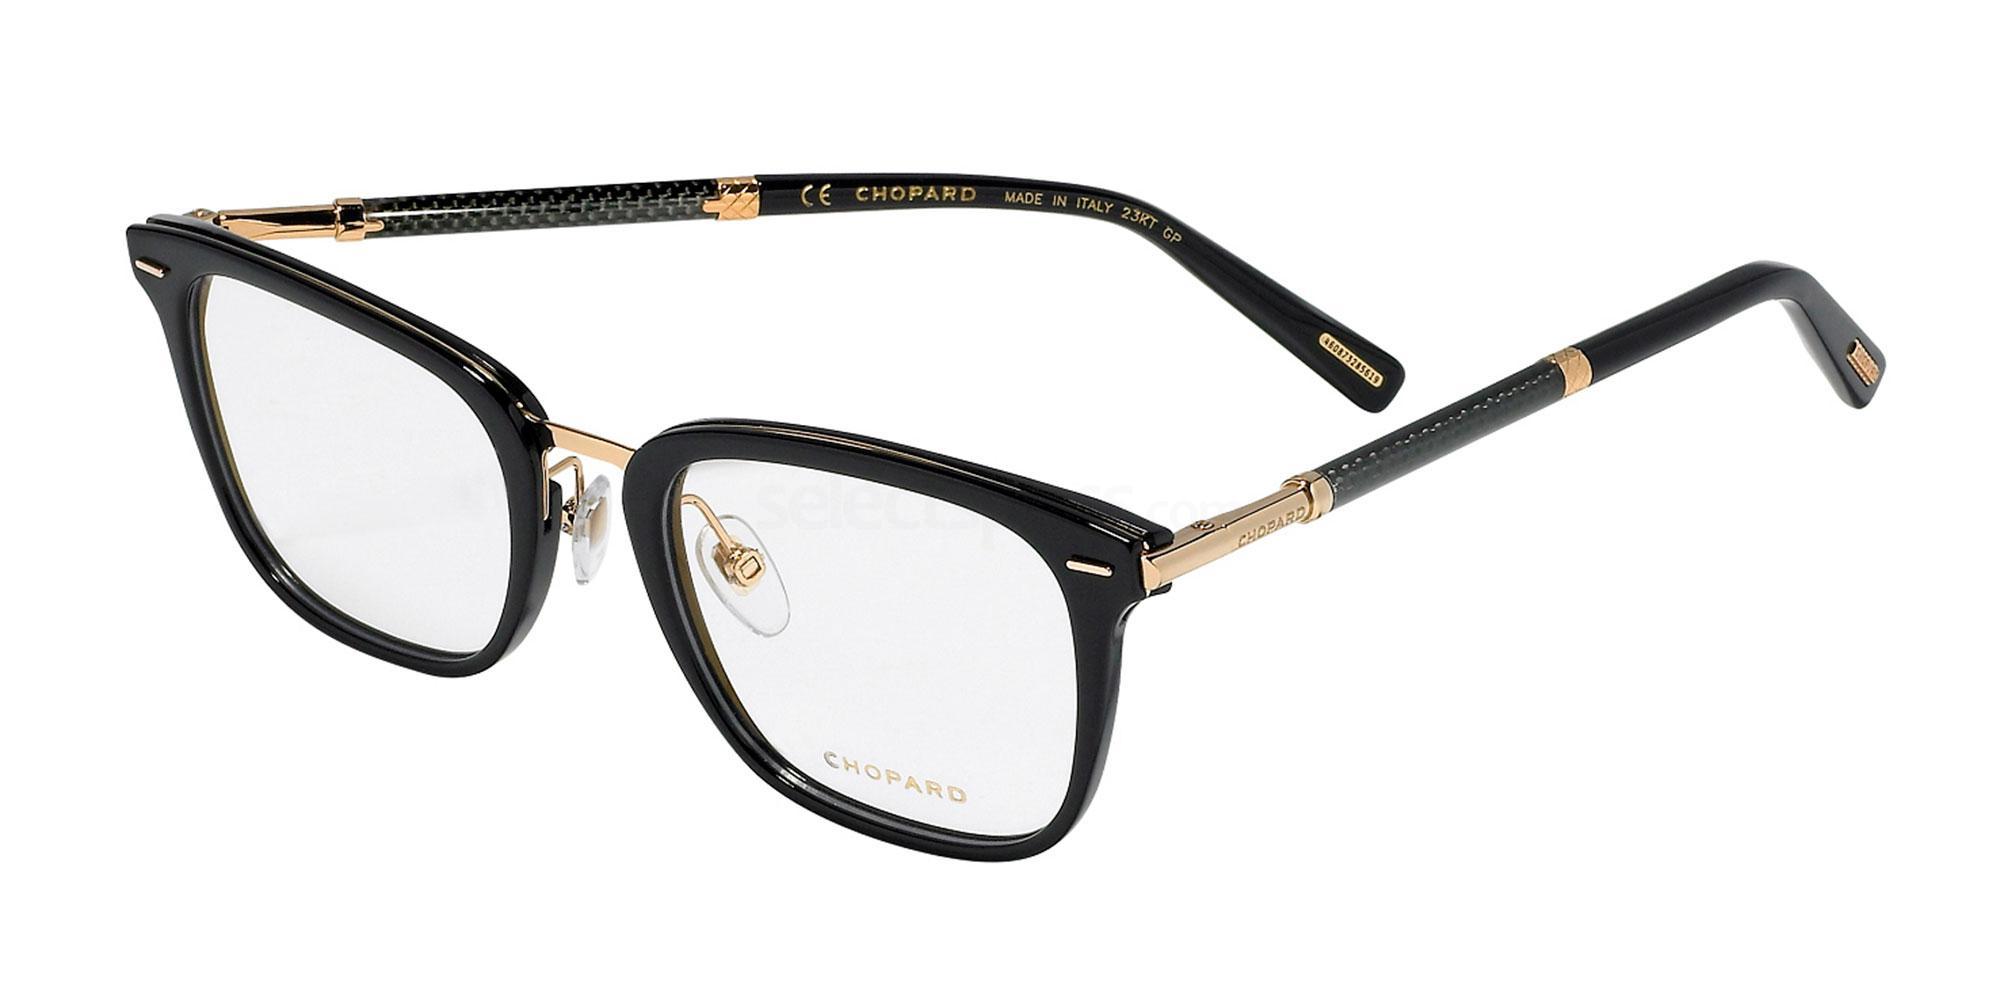 0300 VCHC76 Glasses, Chopard